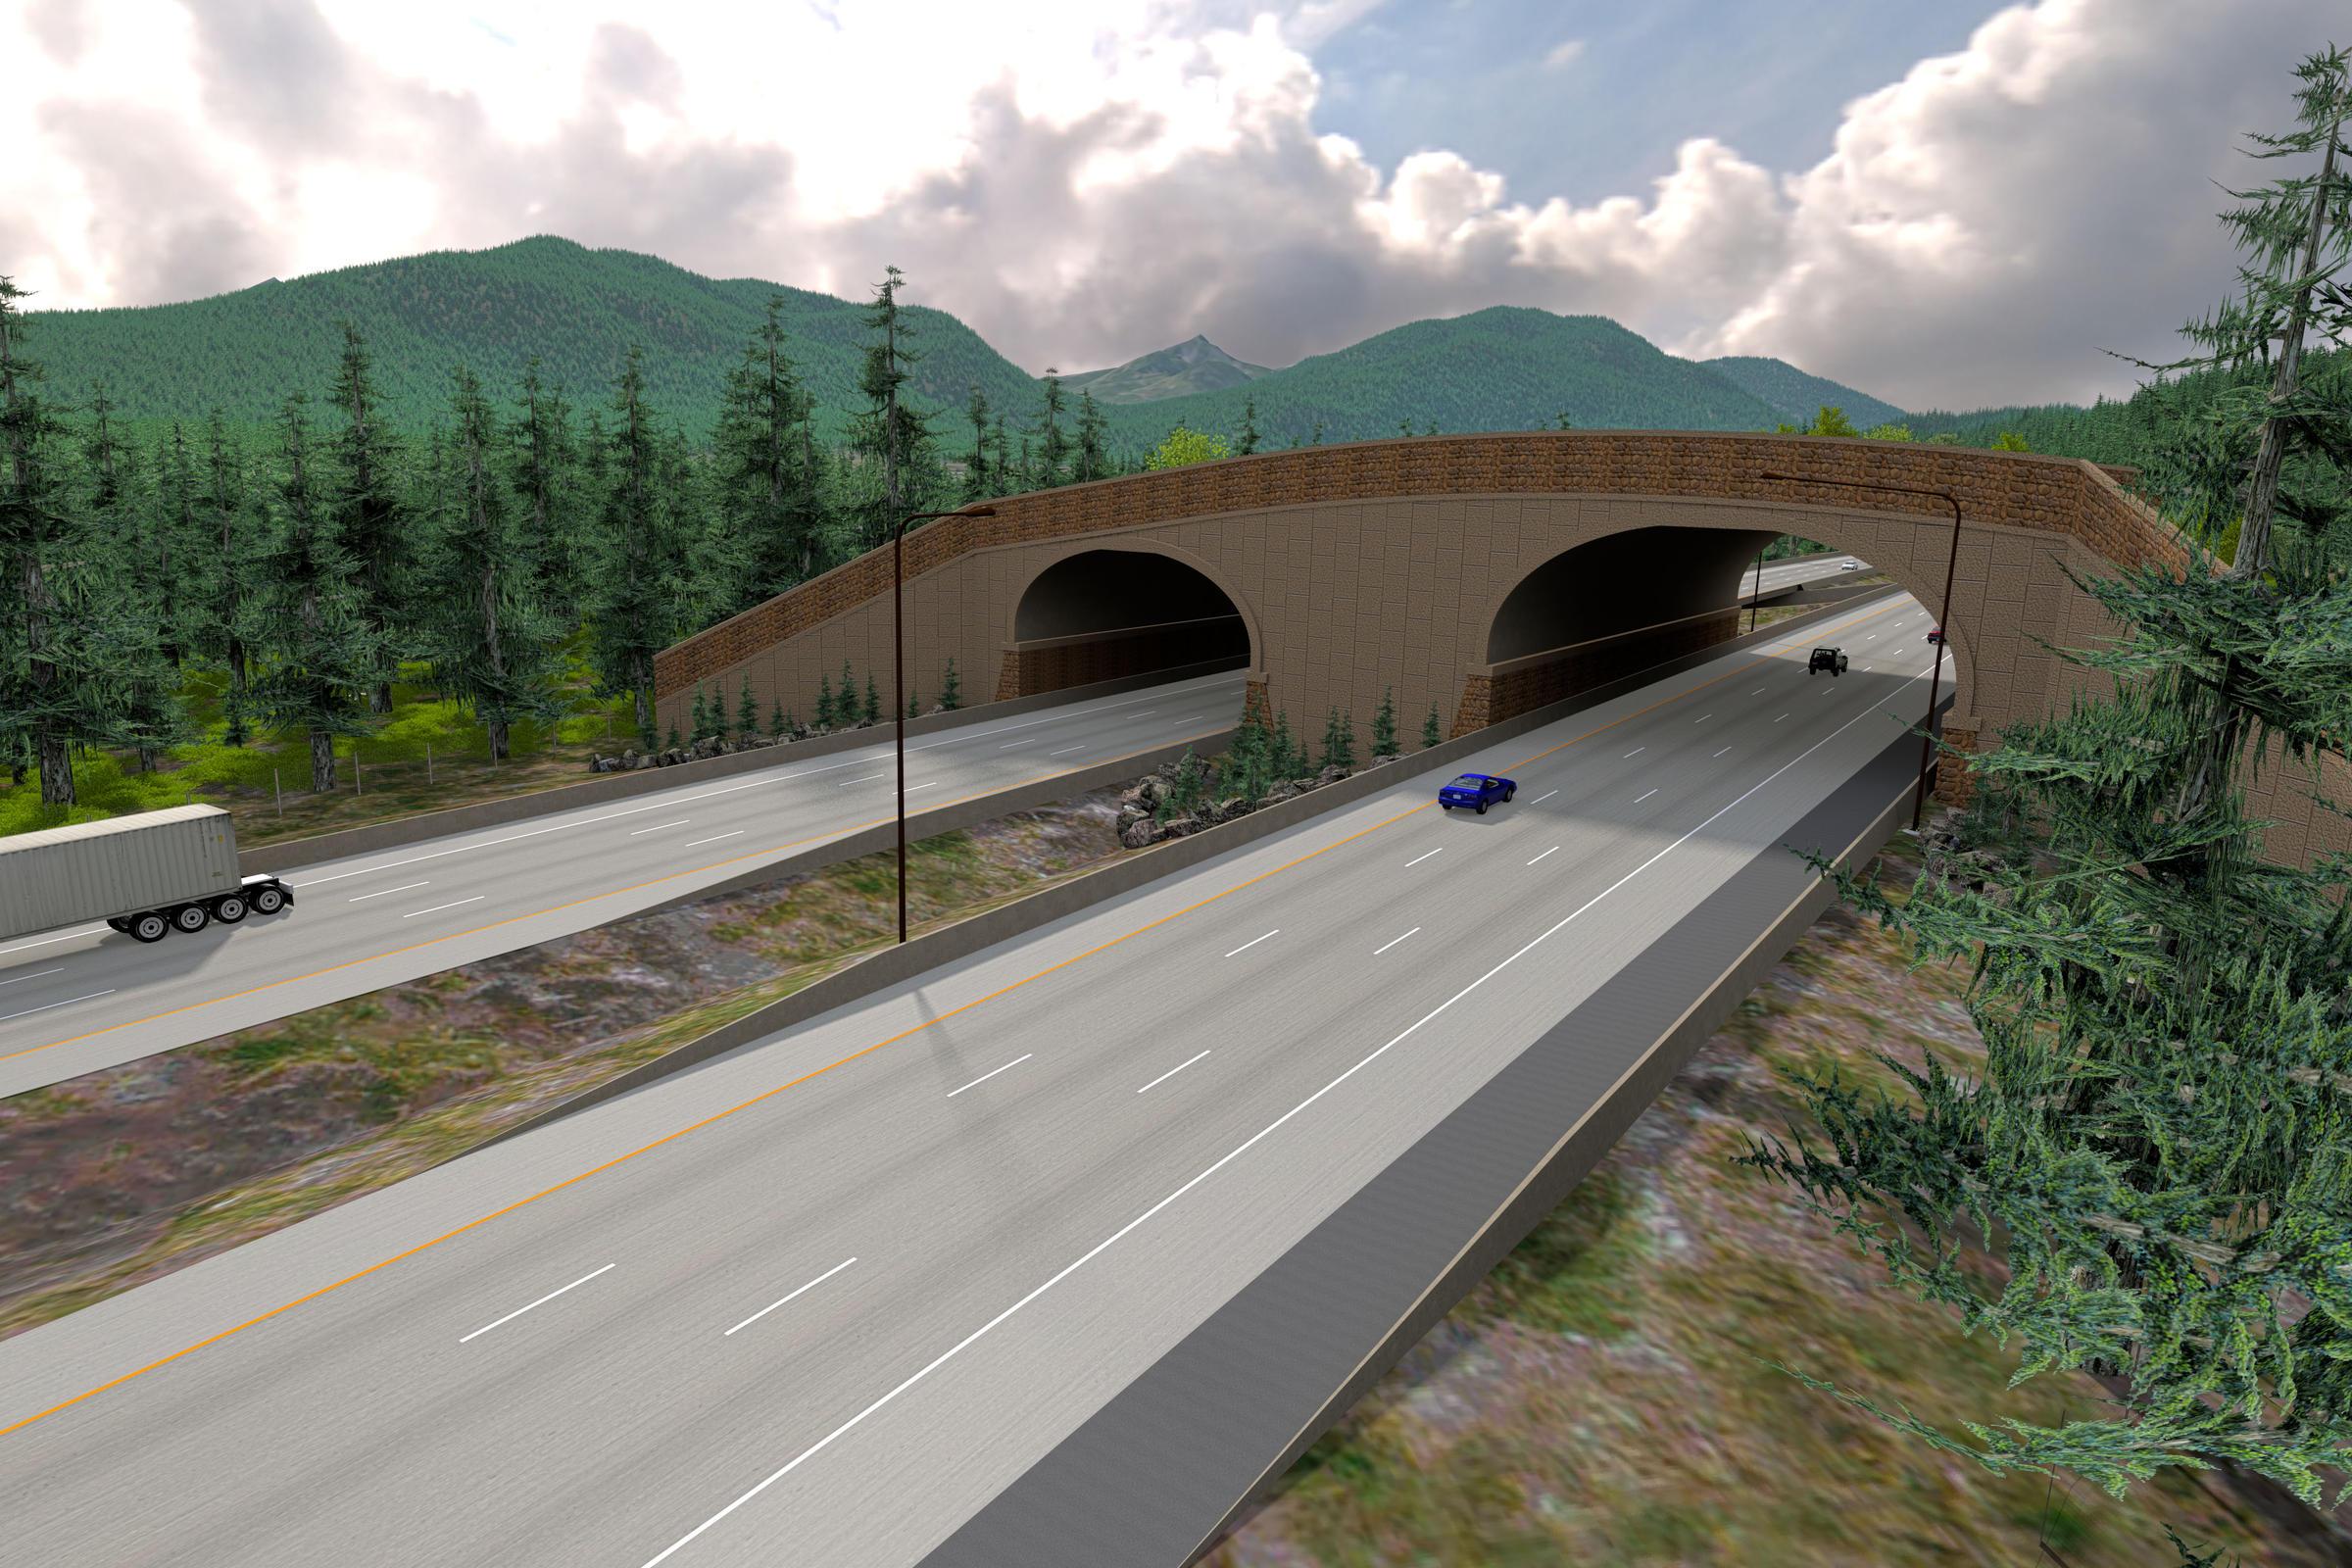 Snakes on an overpass: I-90 installs wildlife crossing near ...